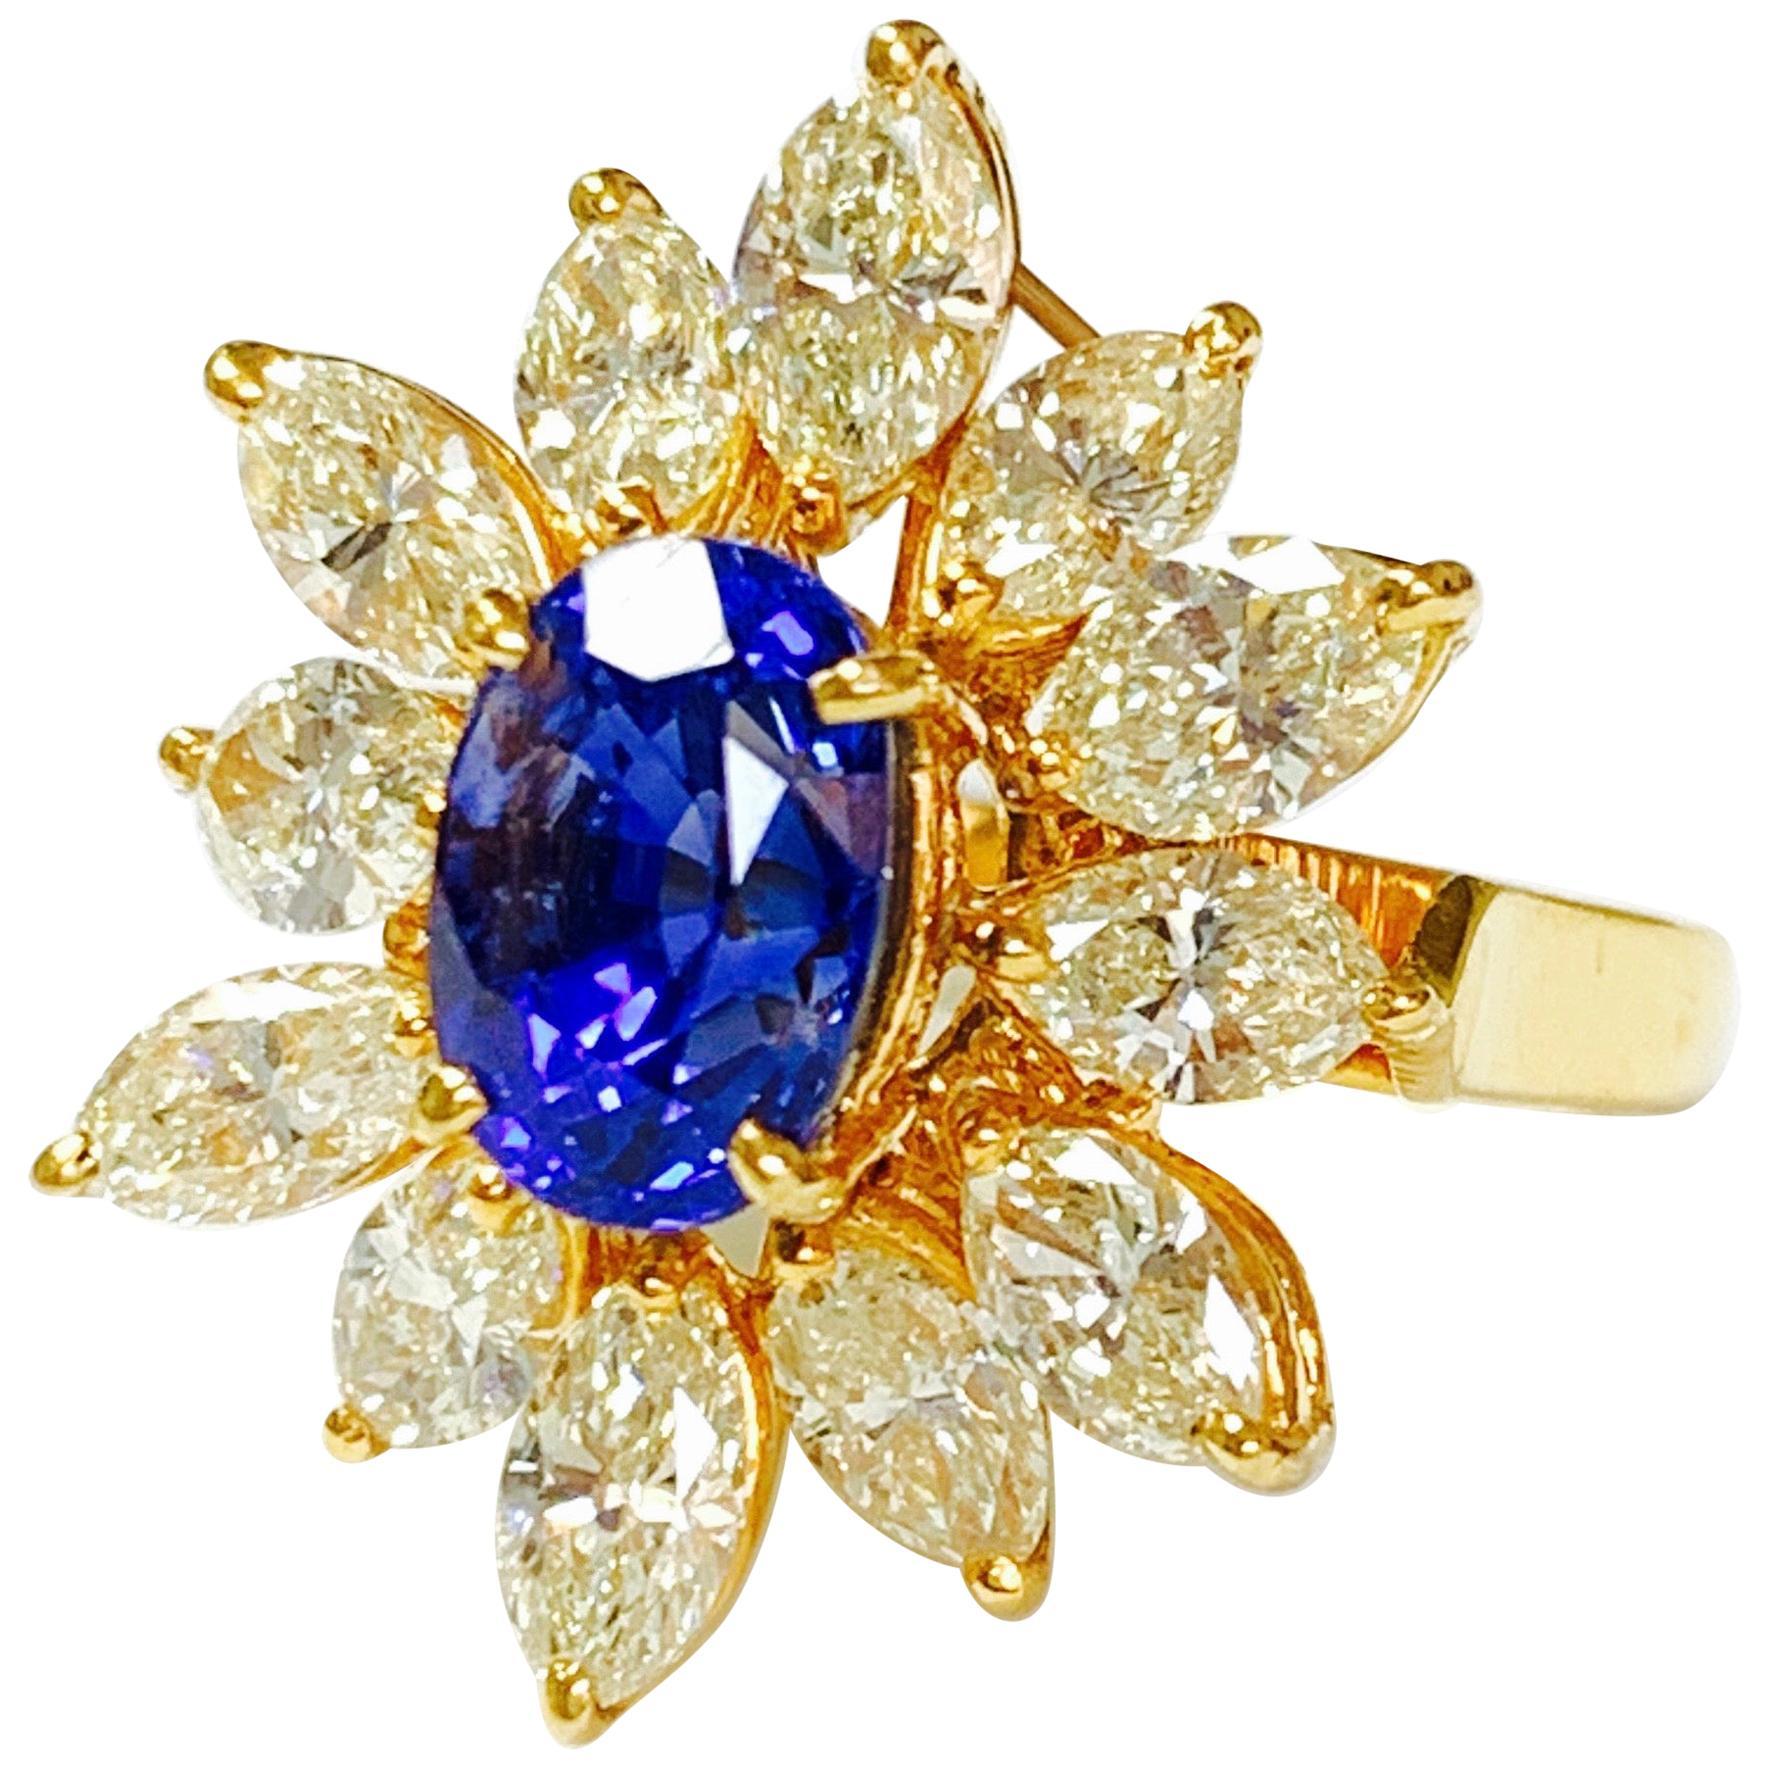 Blue Sapphire and Yellow Diamond Ring in 18 Karat Yellow Gold